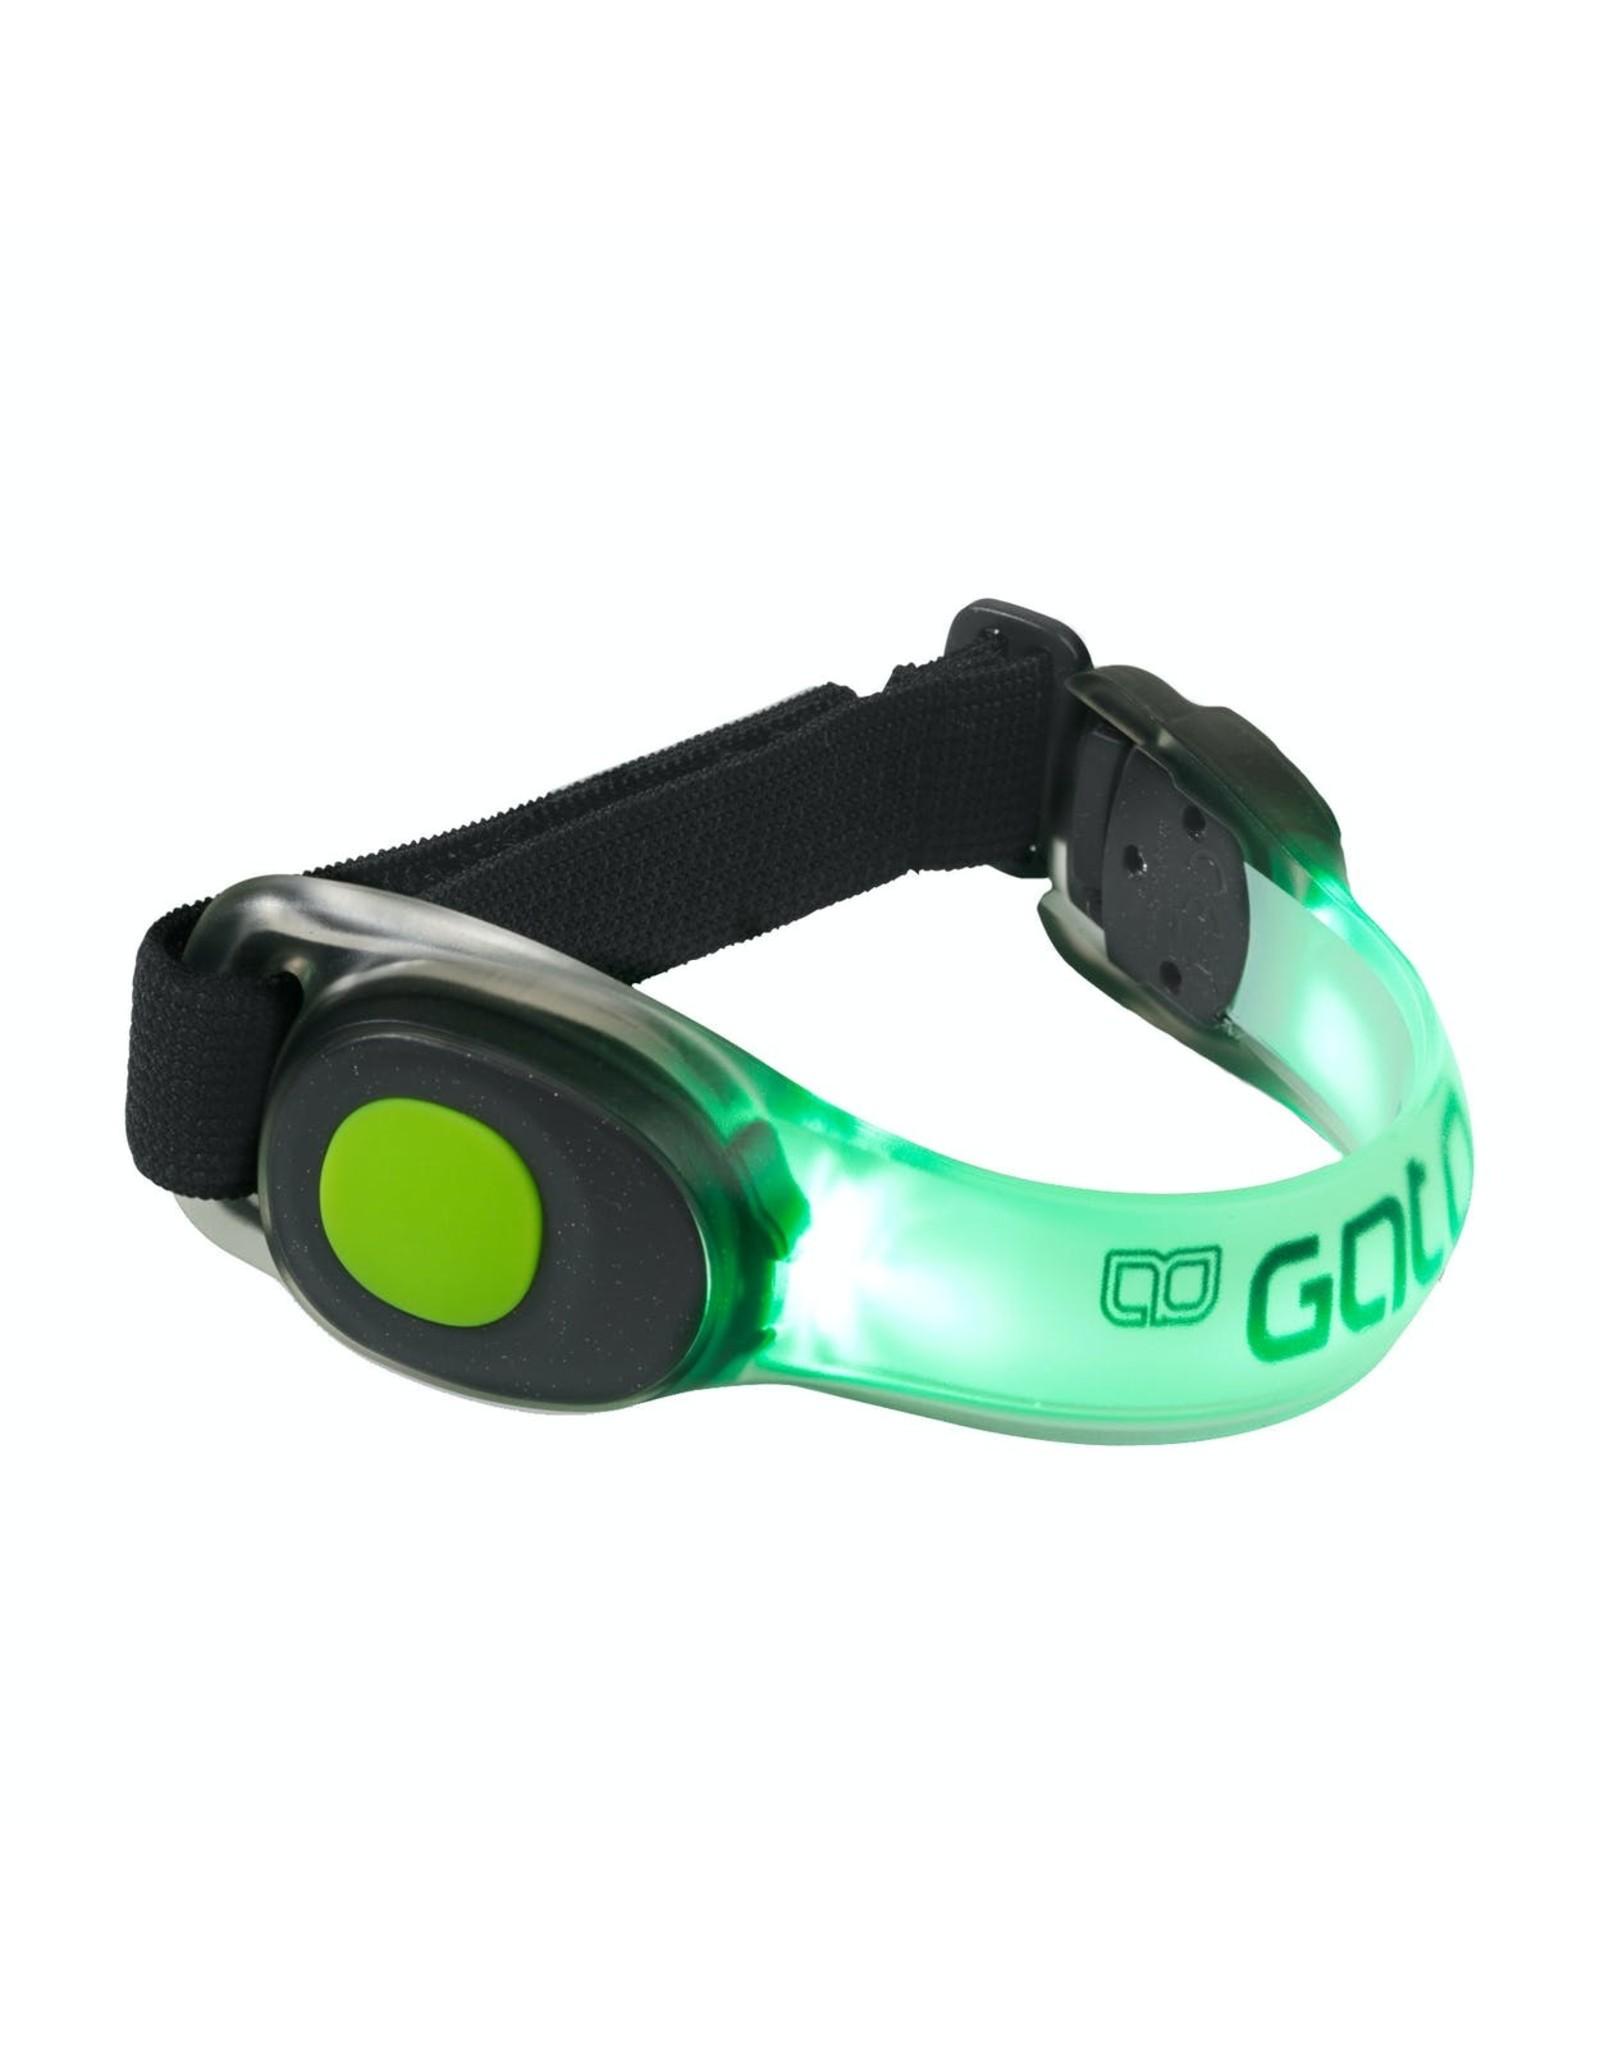 Gato NEON LED ARMBAND (Green)